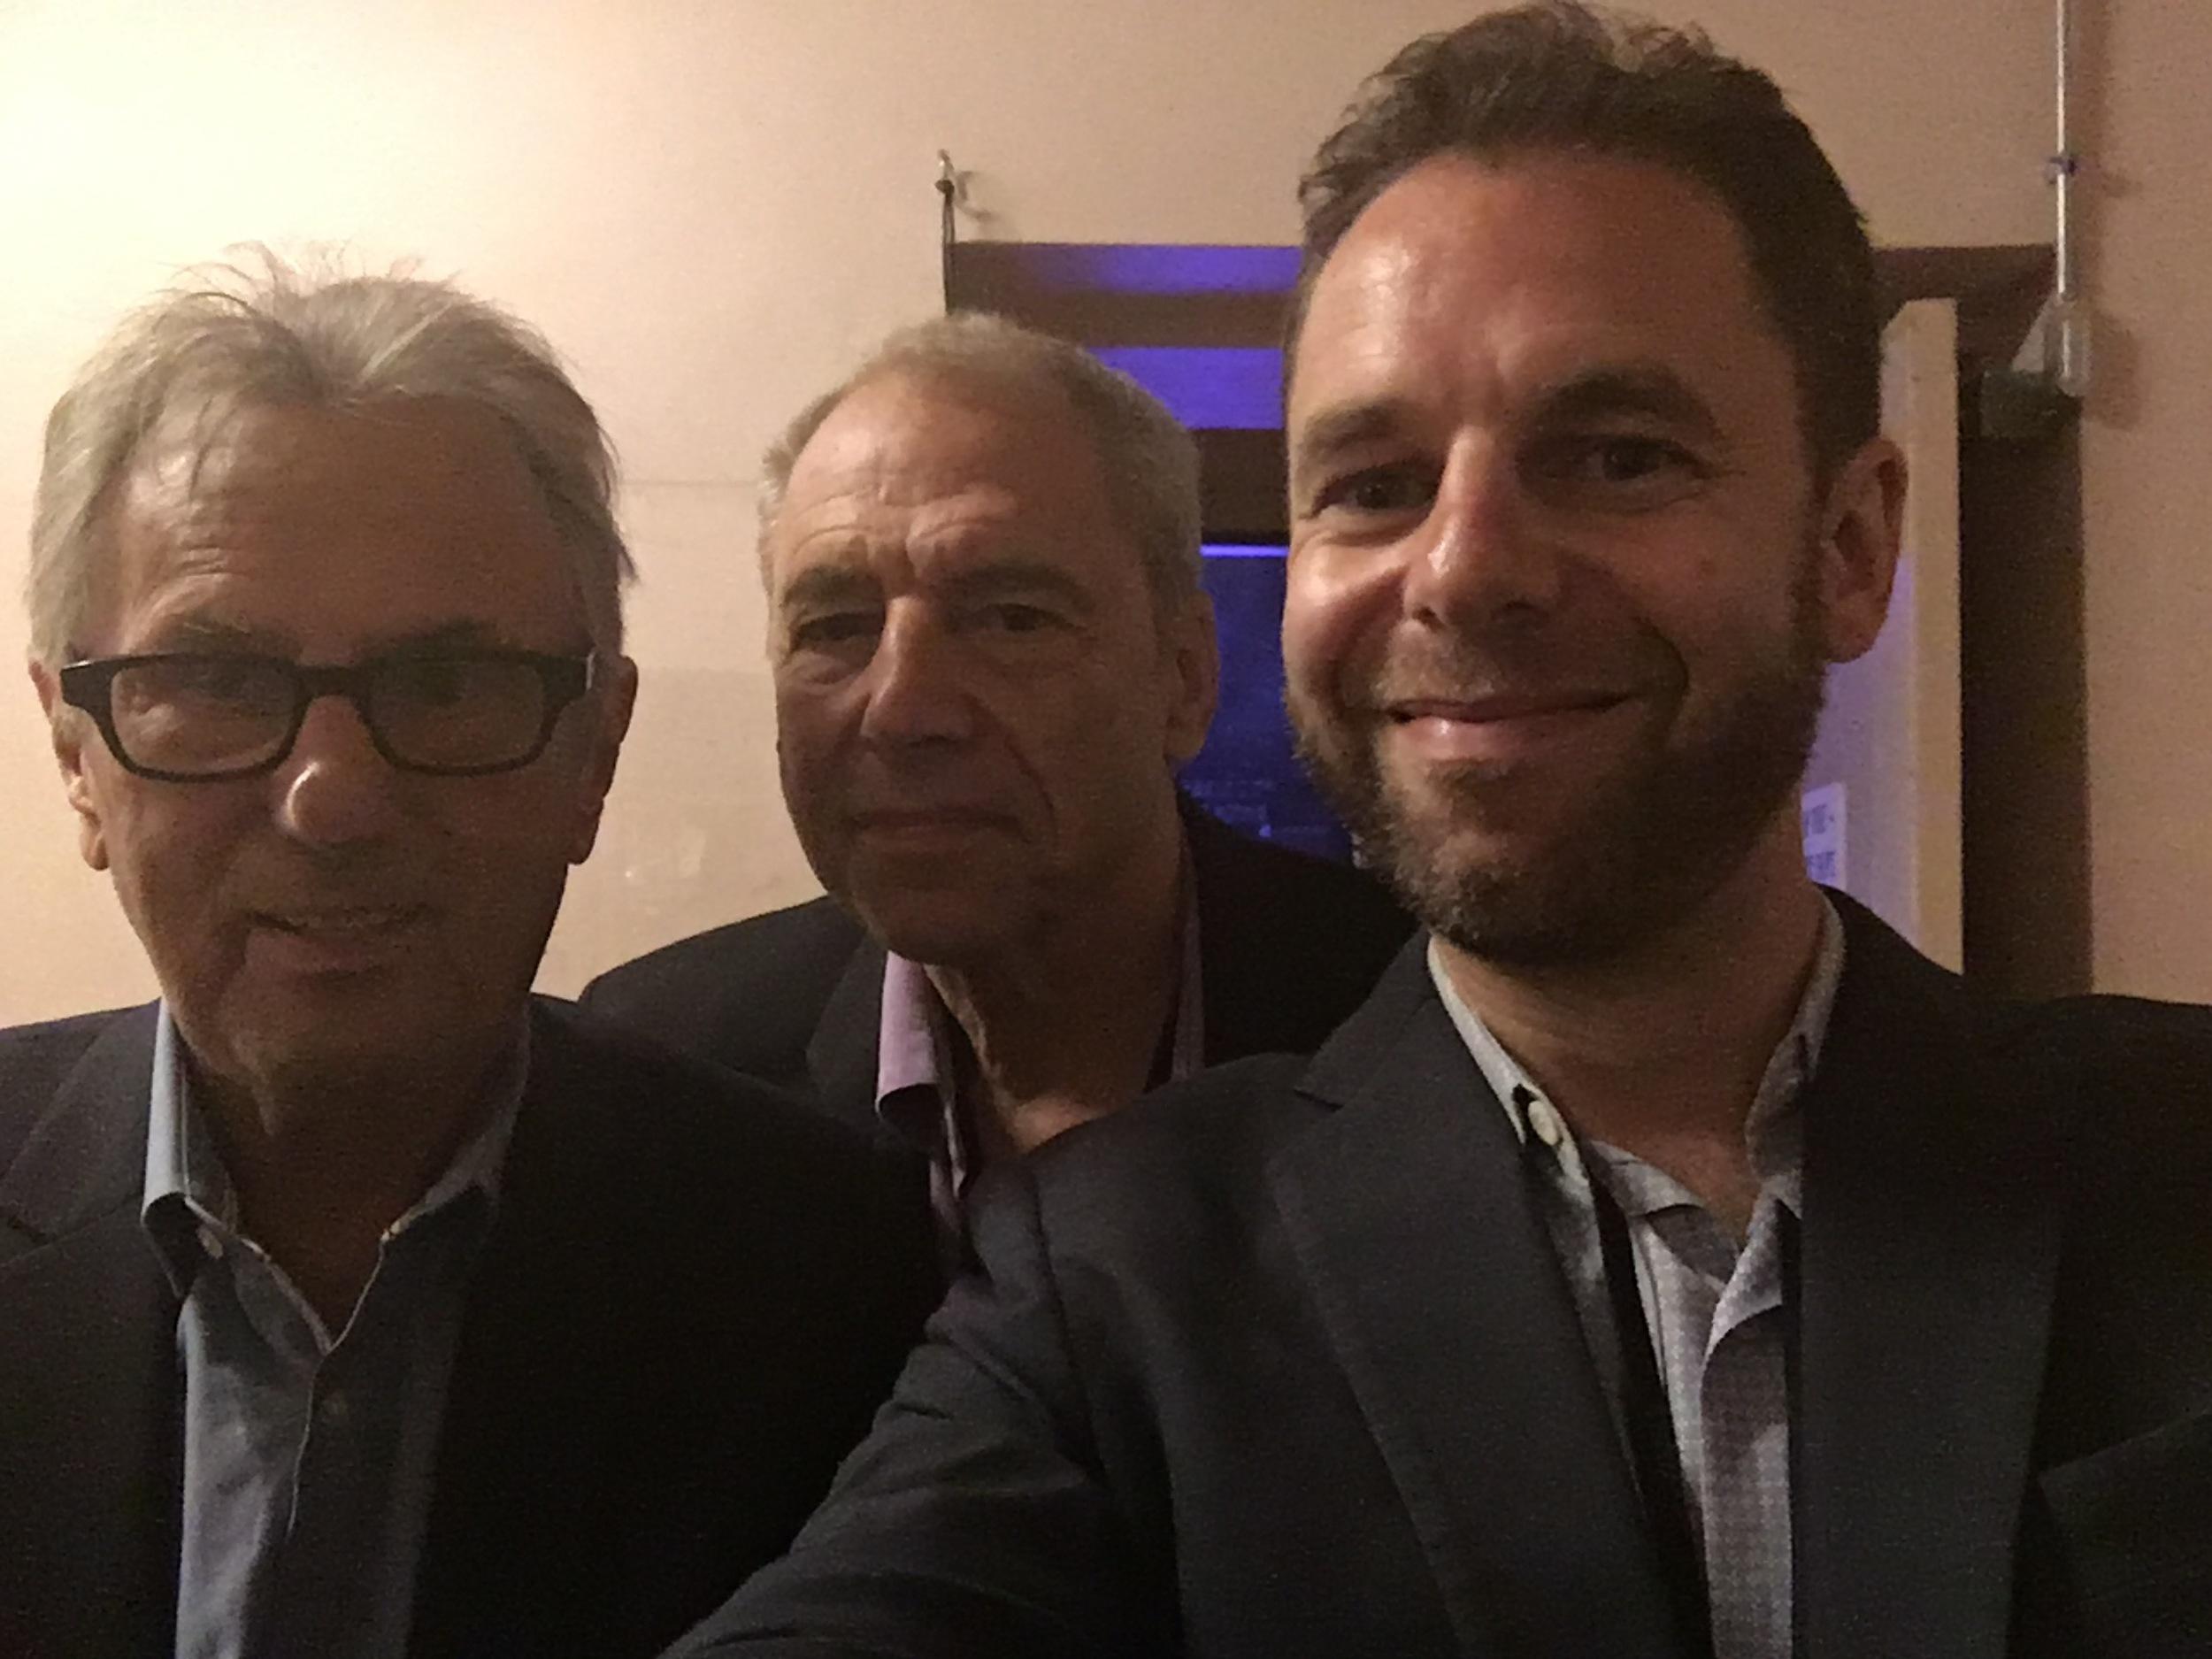 Al Schmitt, Ben Sidran and Leo Sidran in Cleveland (June, 2016)